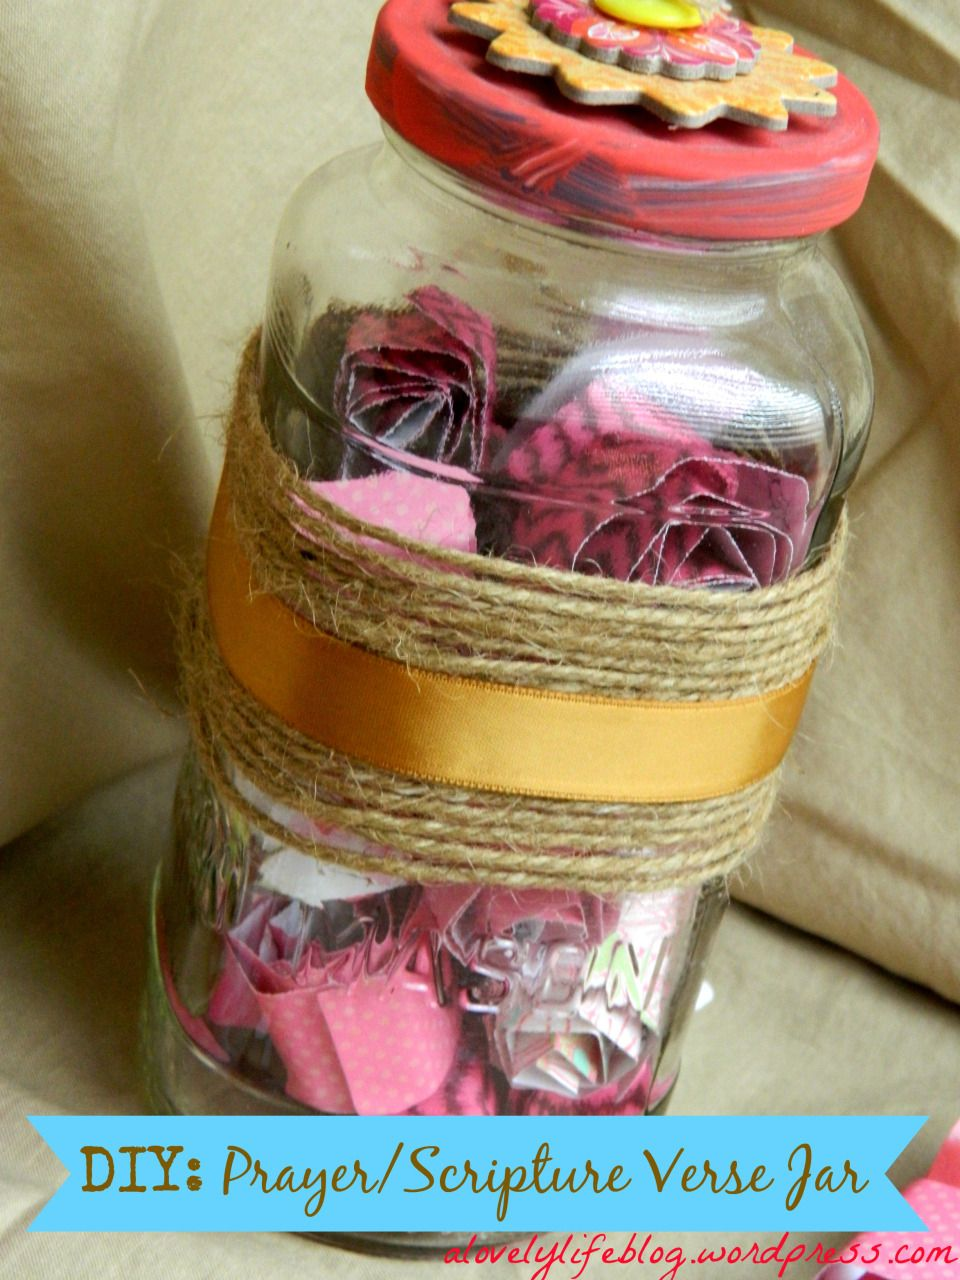 DIY Prayer/Scripture Verse Jar